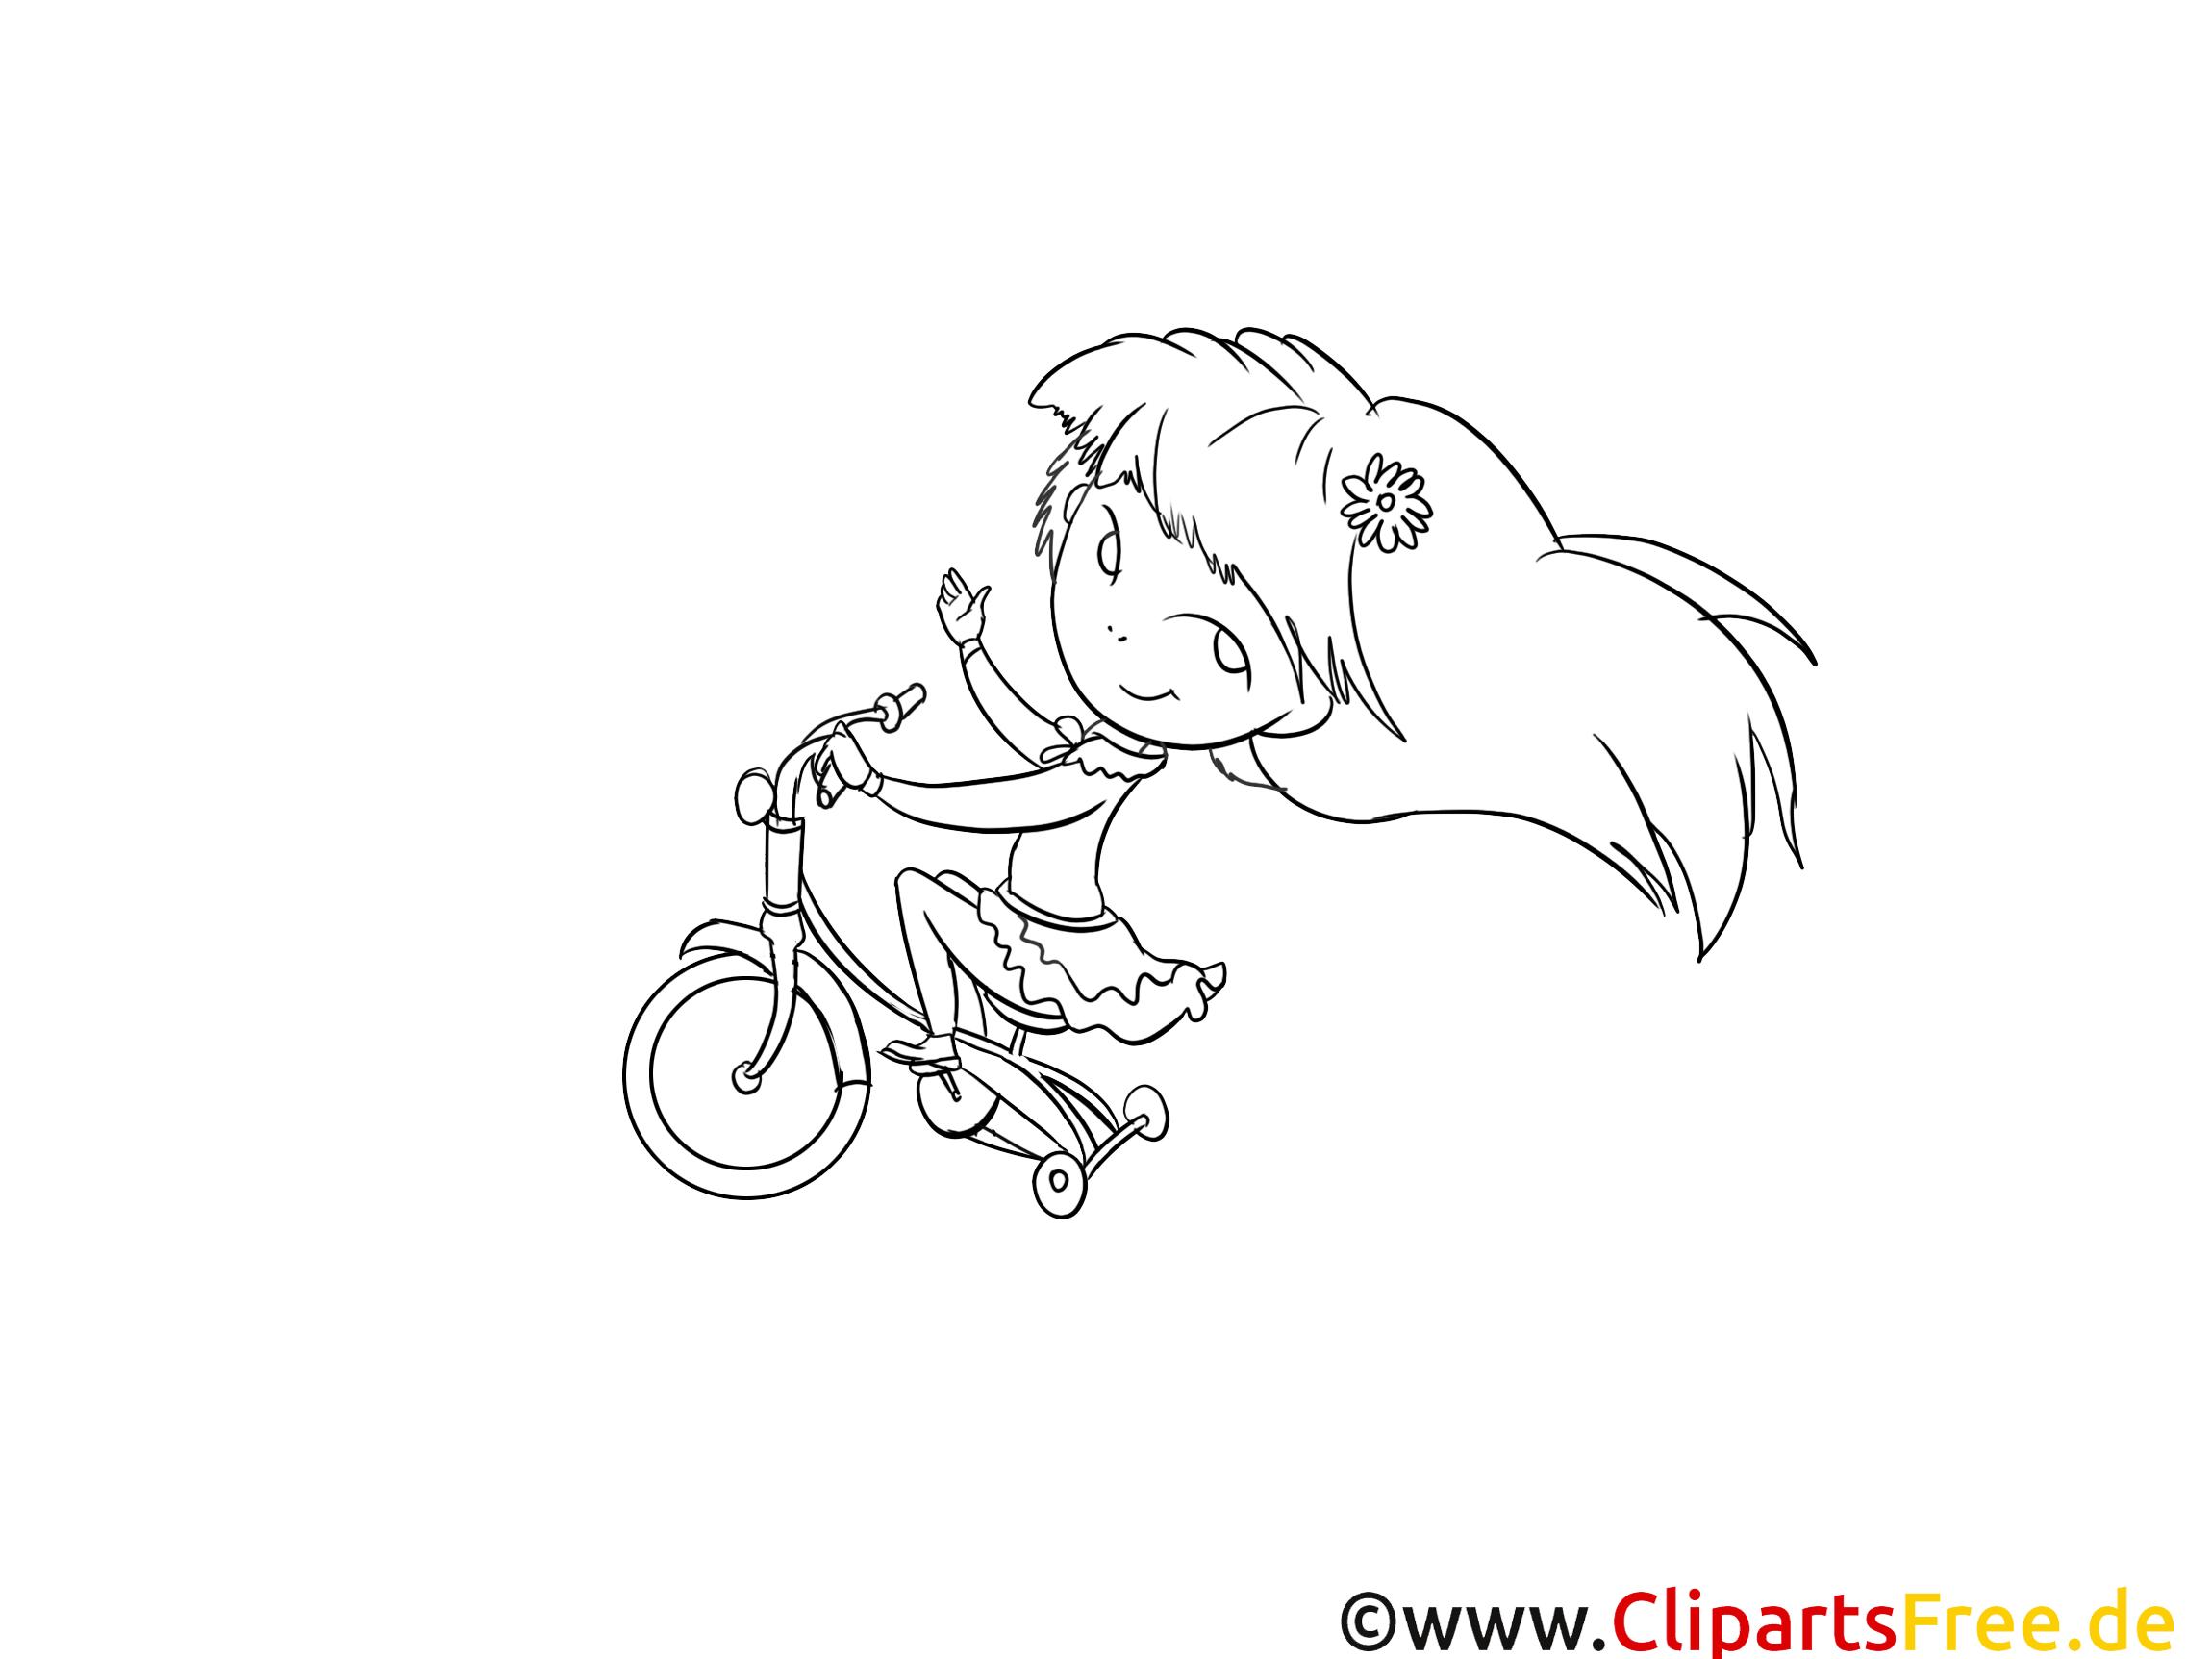 Bicyclette dessin coloriage fille t l charger fille - Dessin bicyclette ...